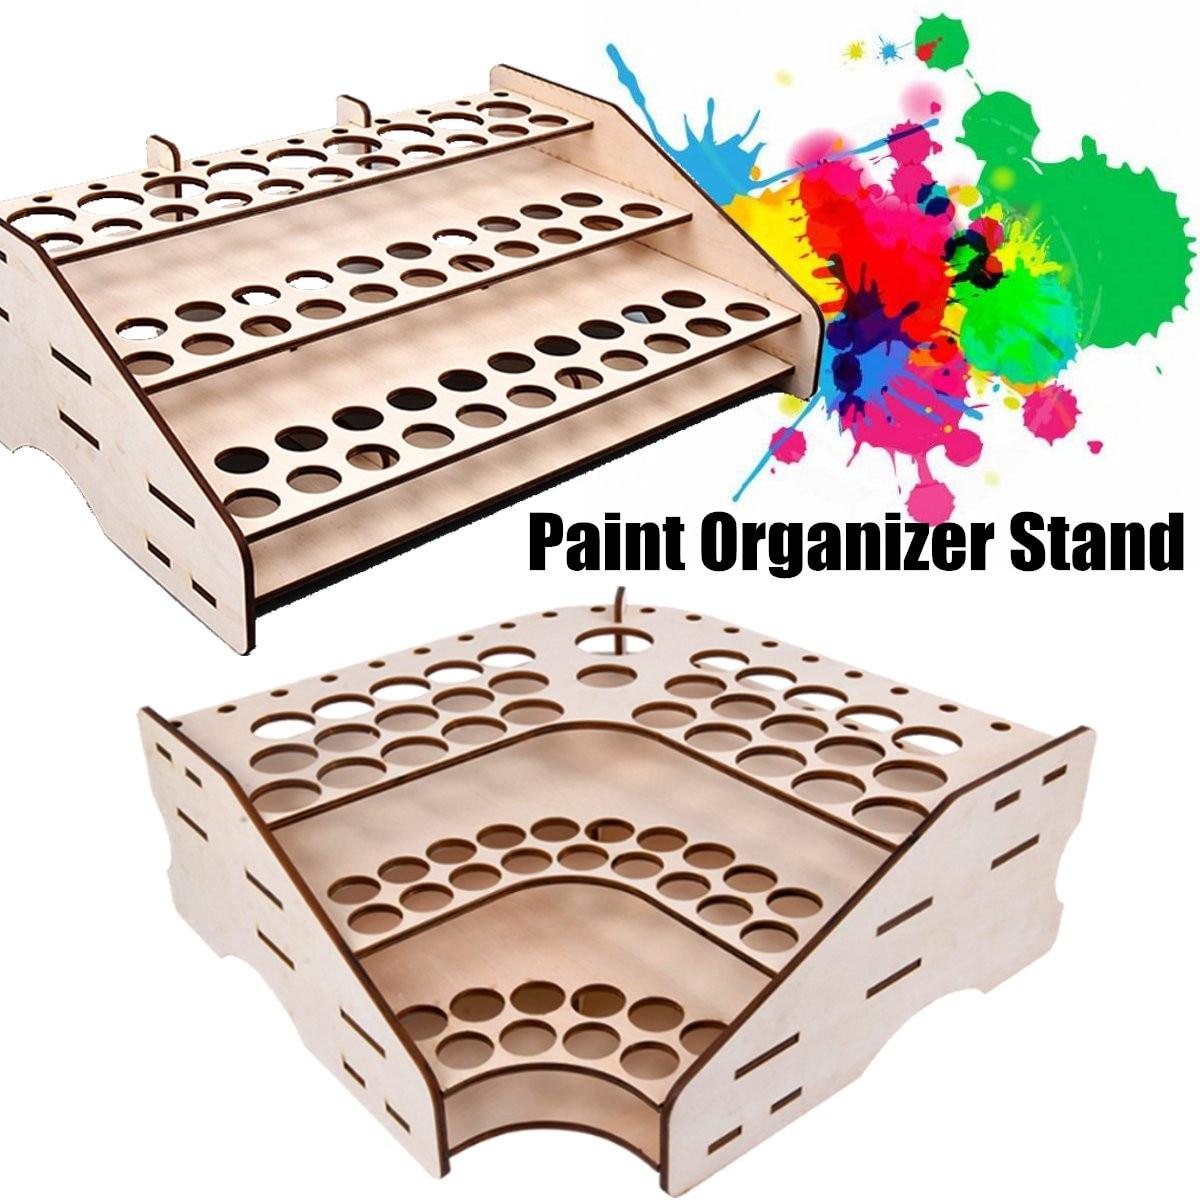 74/81 Bottles Wooden Pigment Bottle Storage Organizer Color Paint Ink Brush Stand Rack Modular Holder Home School 3 Layers